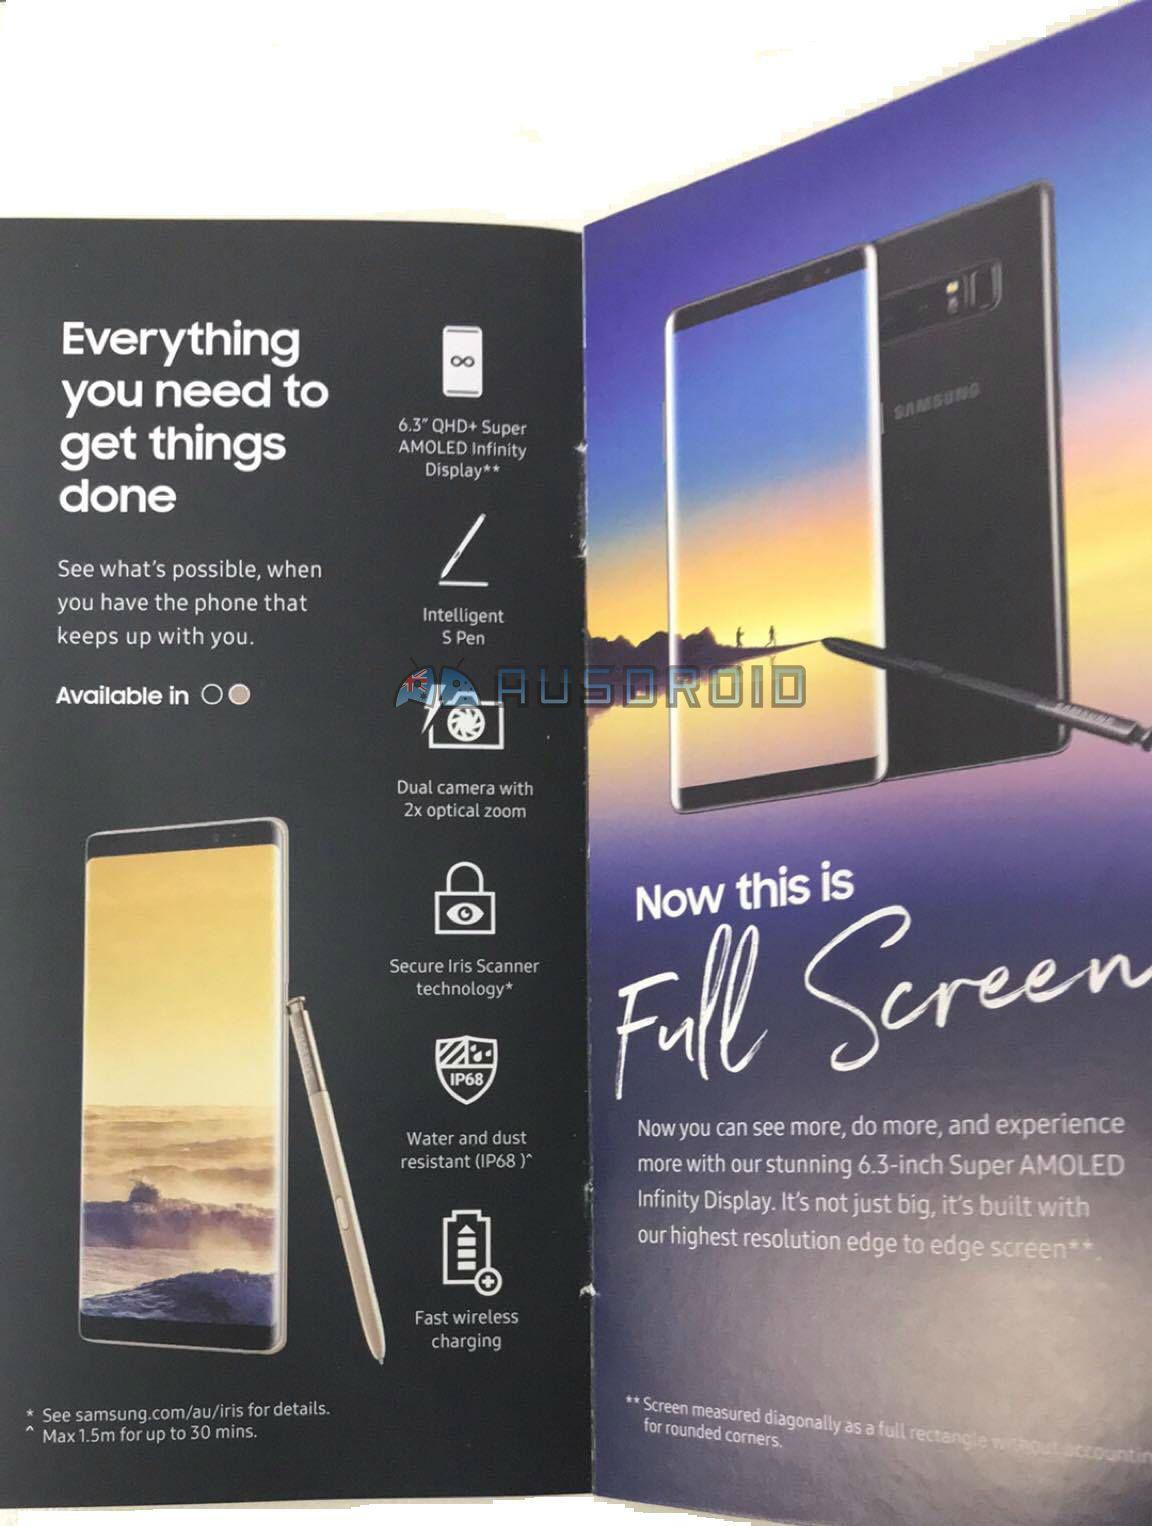 Samsung Galaxy Note 8 Functii Dezvaluite Material Promotional